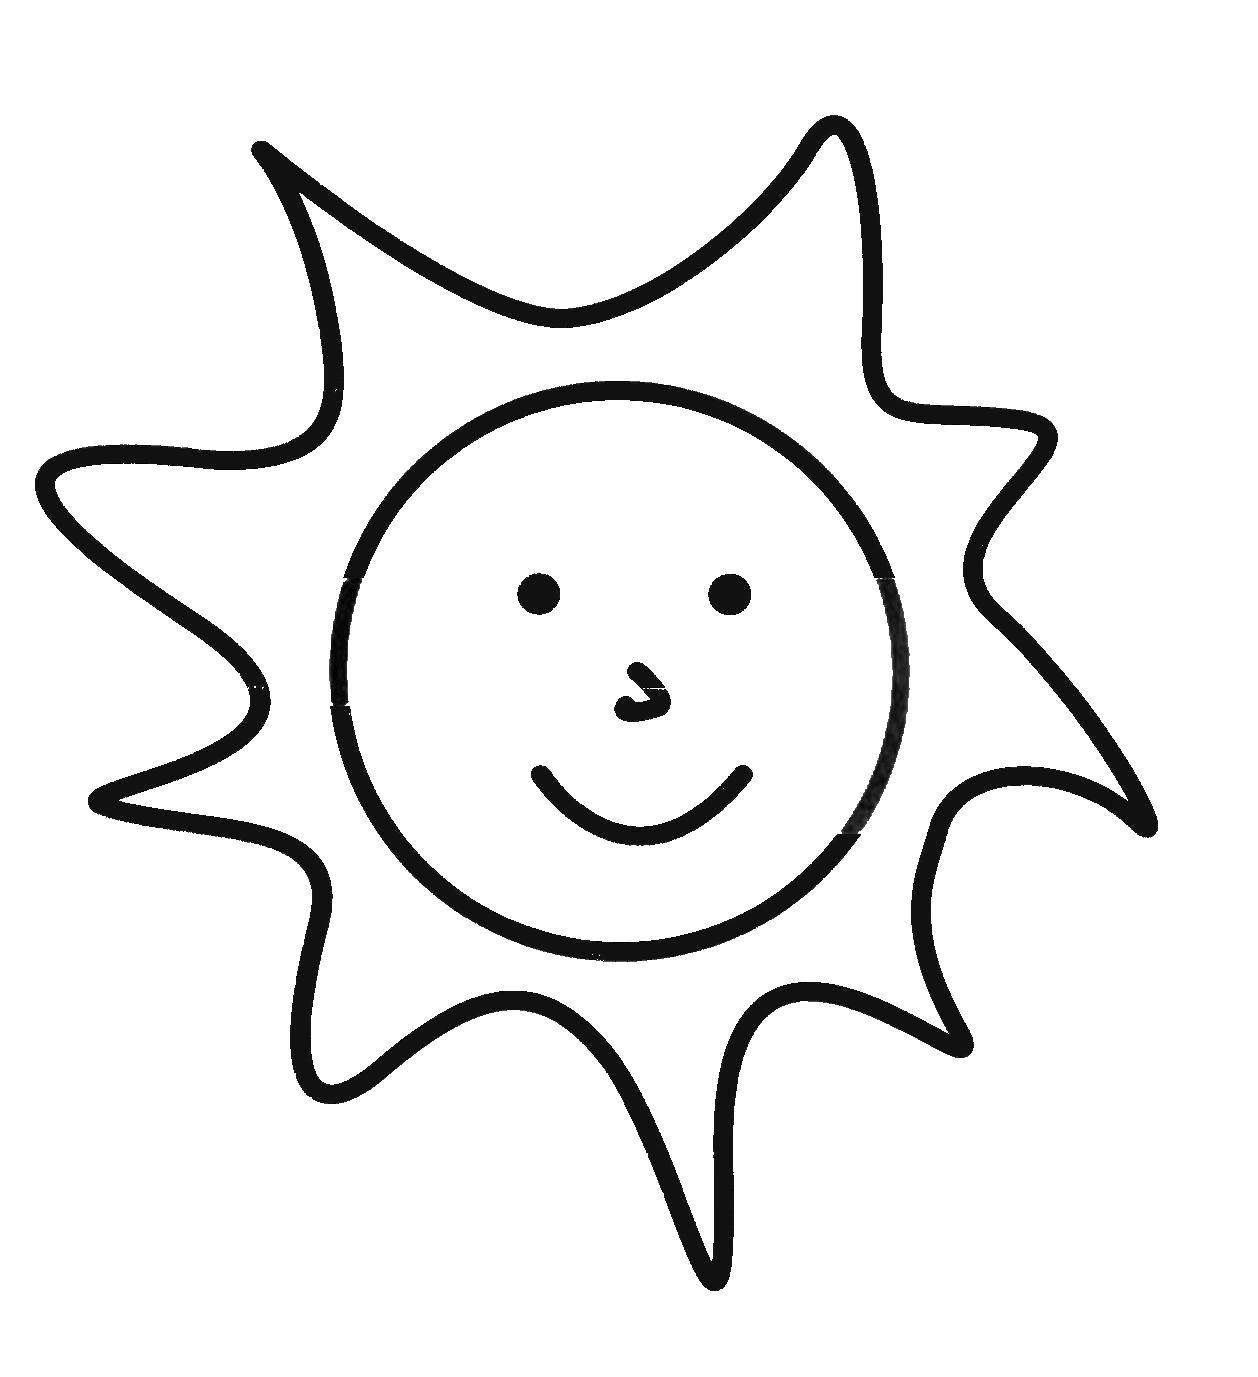 Раскраски солнце веселое солнце раскраска